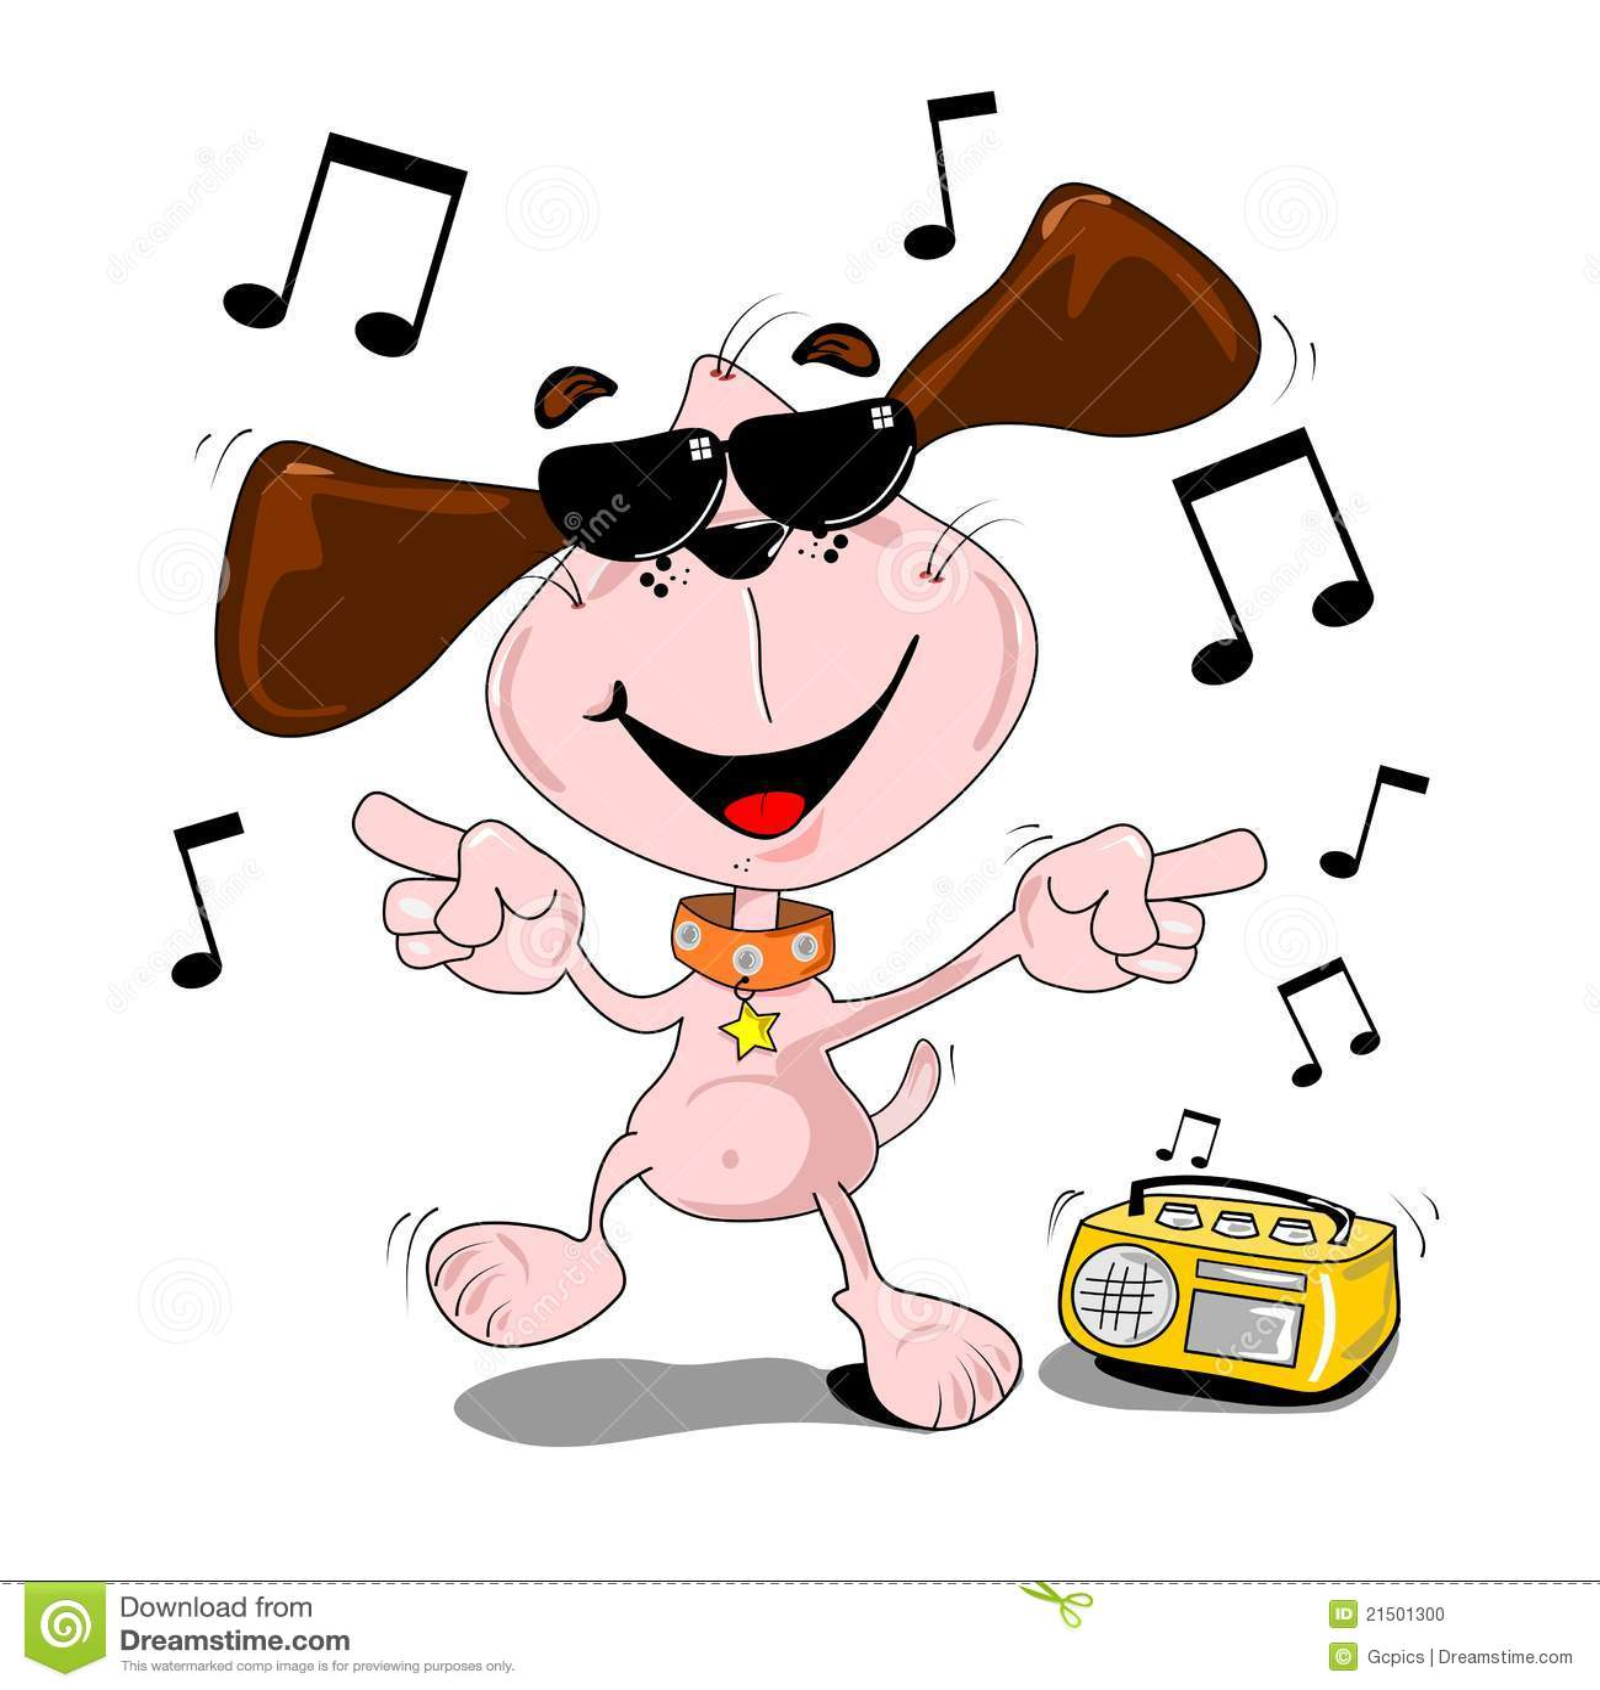 Cartoon Dog Dancing Stock Photo - Image: 21501300